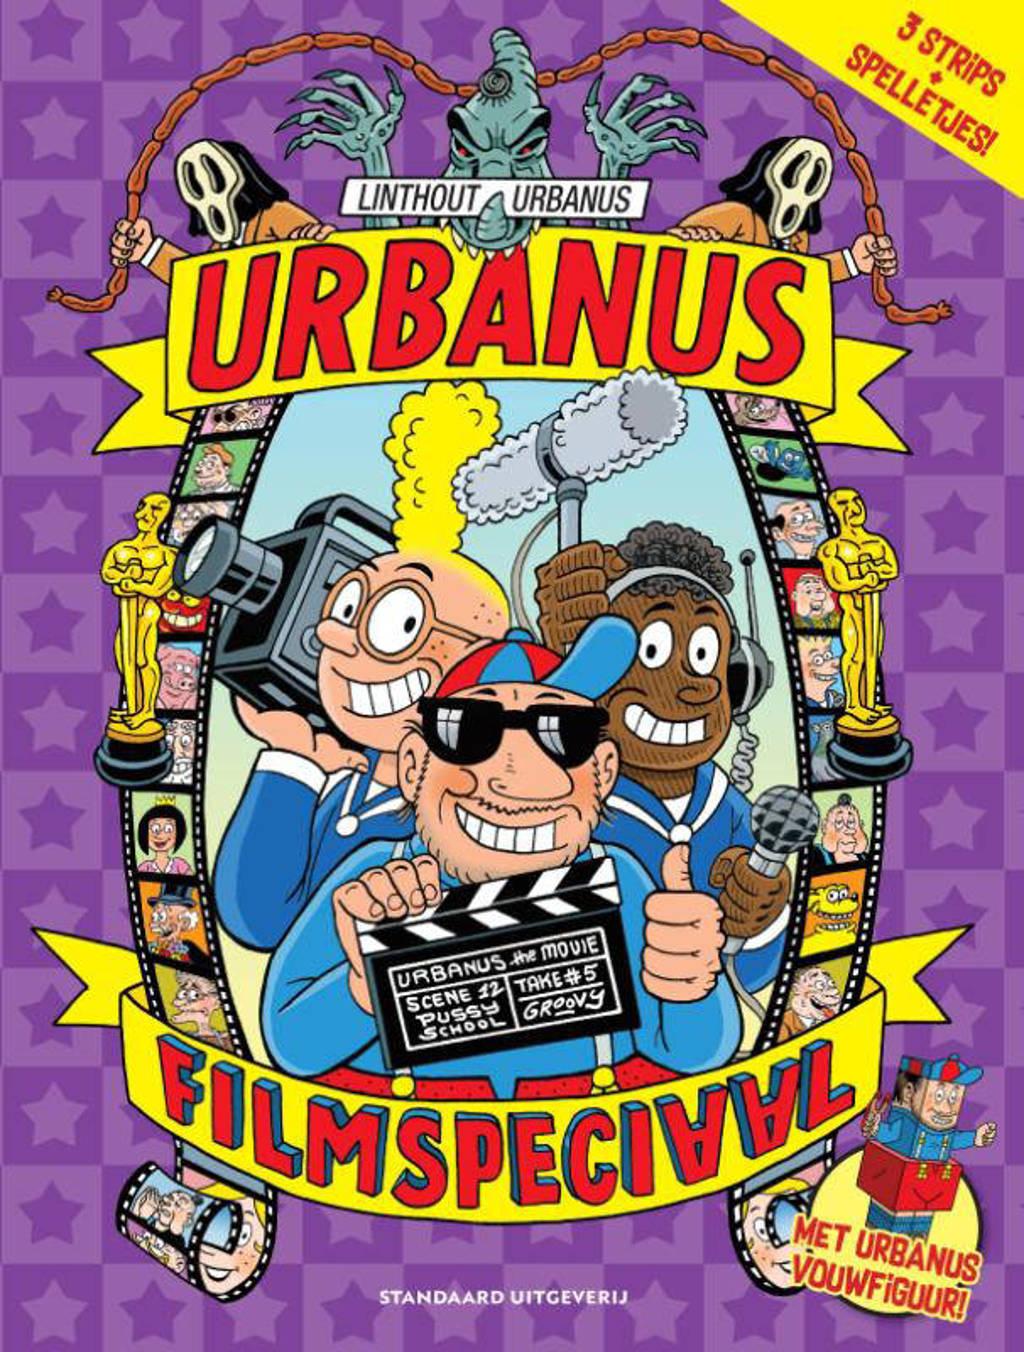 Urbanus: Filmspecial - Willy Linthout en